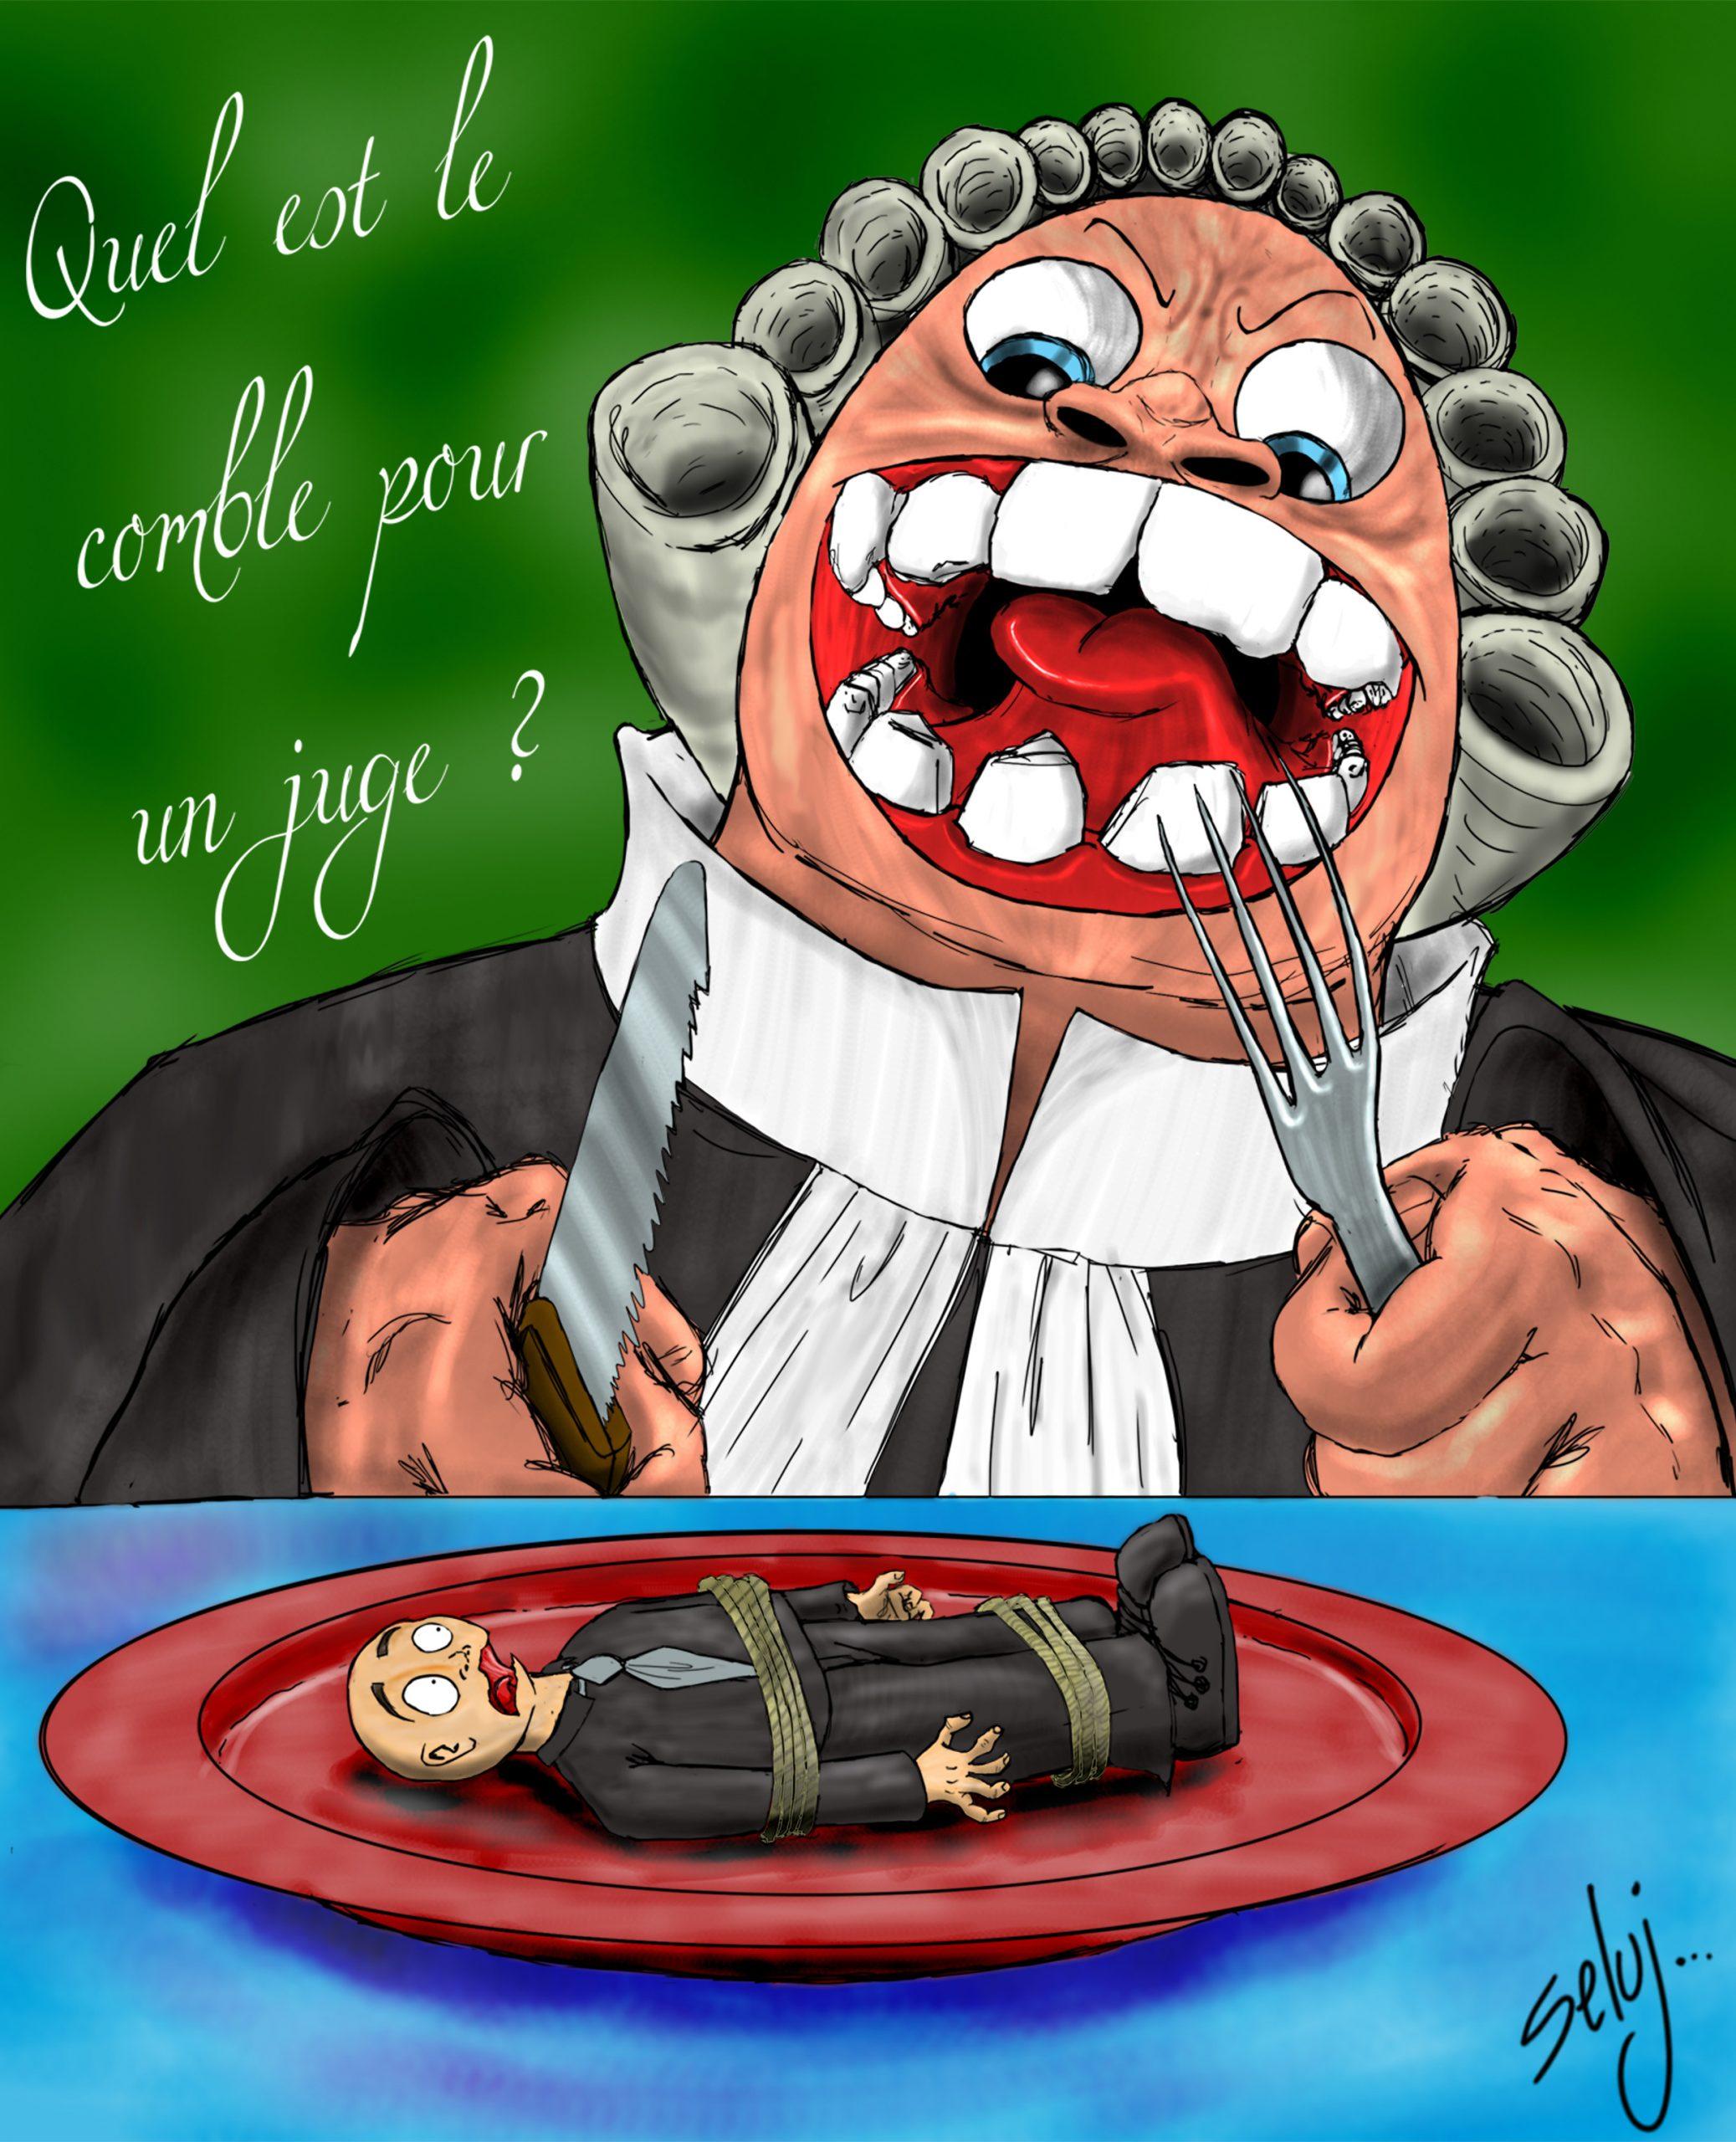 De manger des avocats